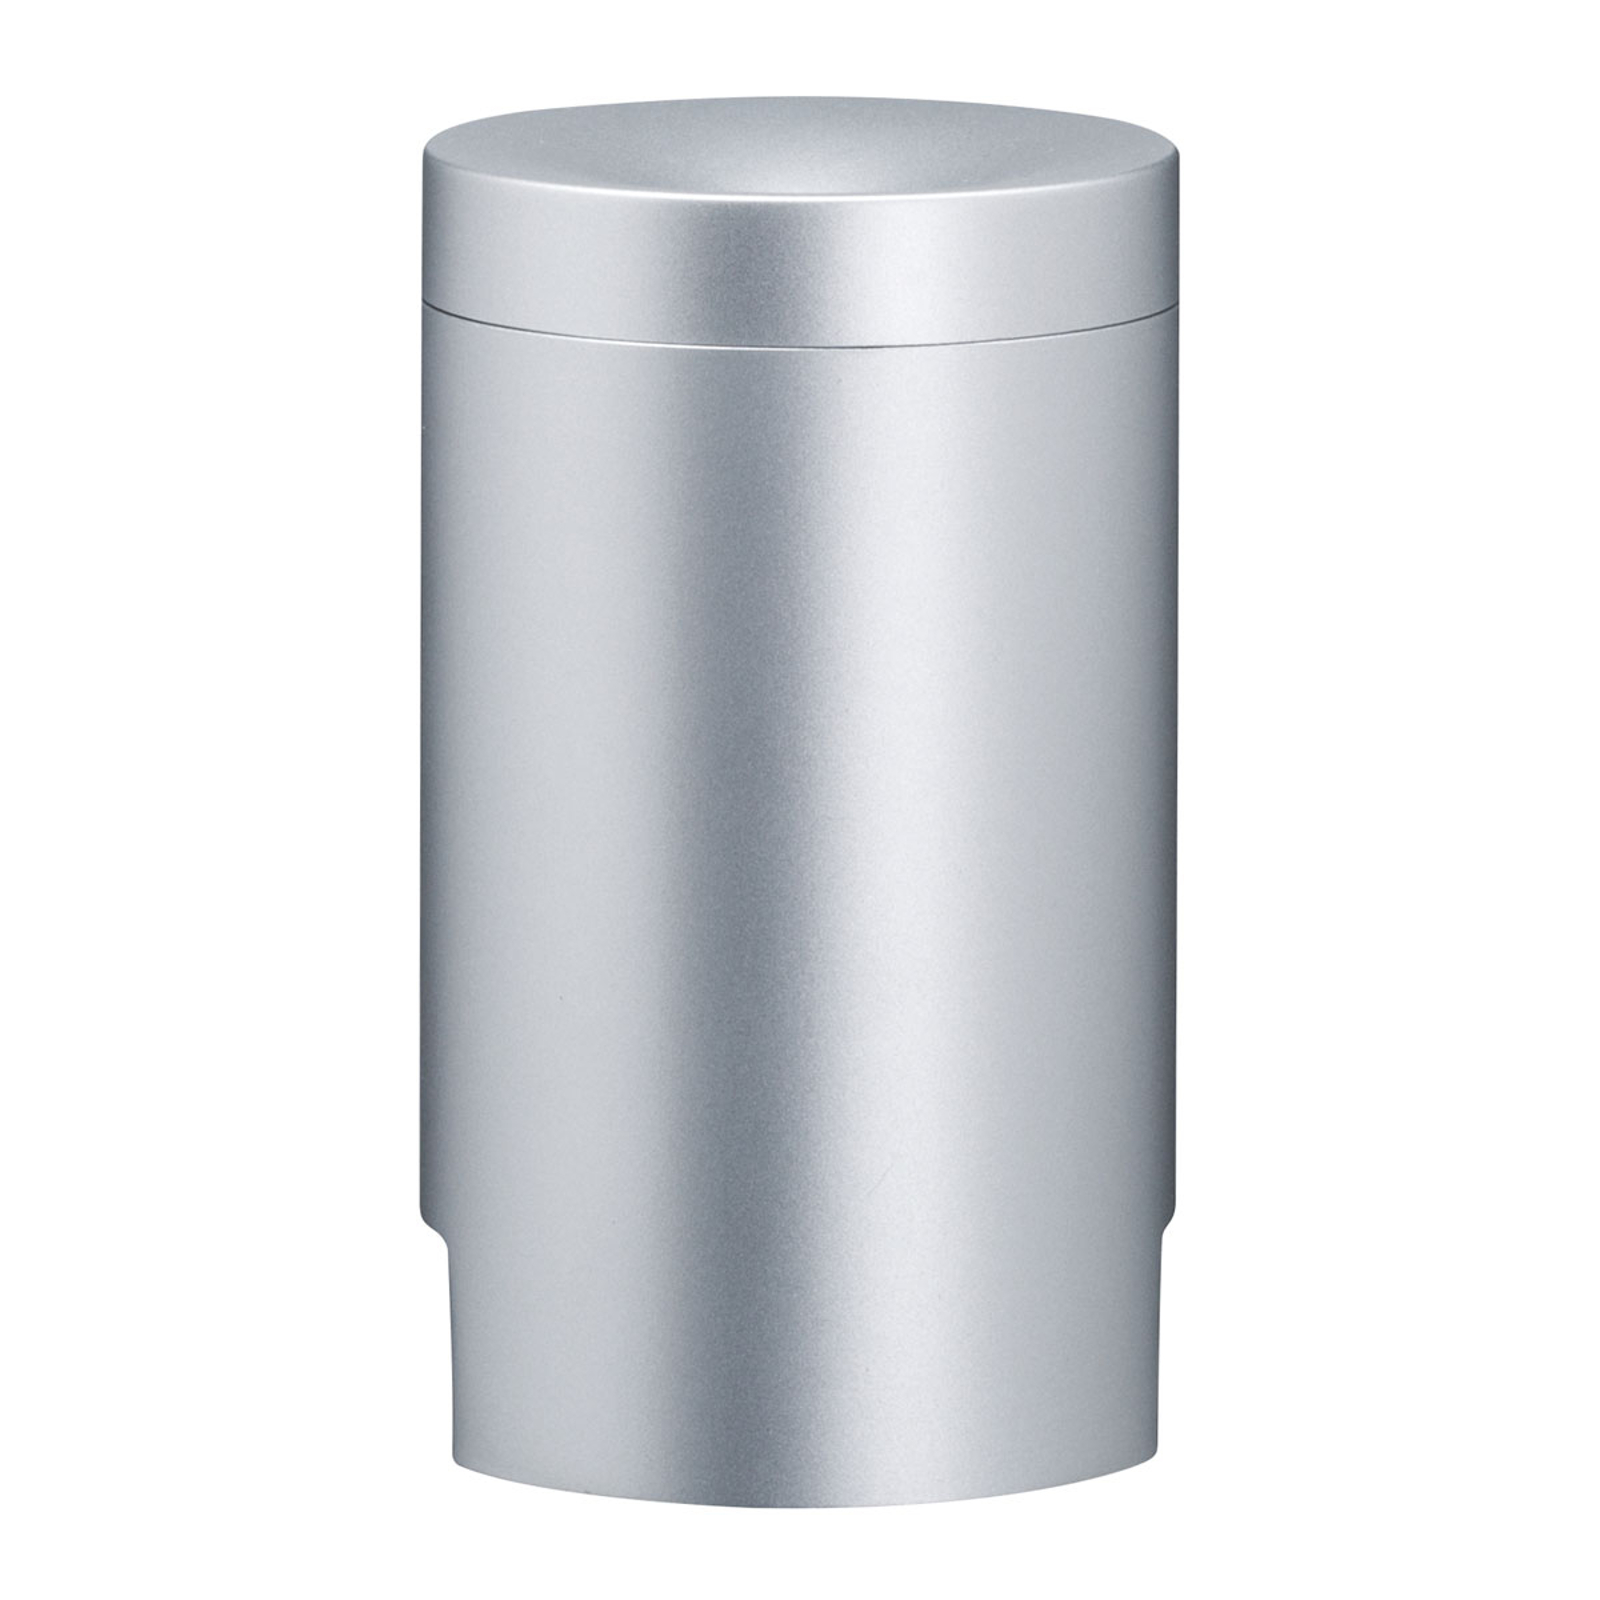 Paulmann Universal Pendel Adapter, chrom matowy